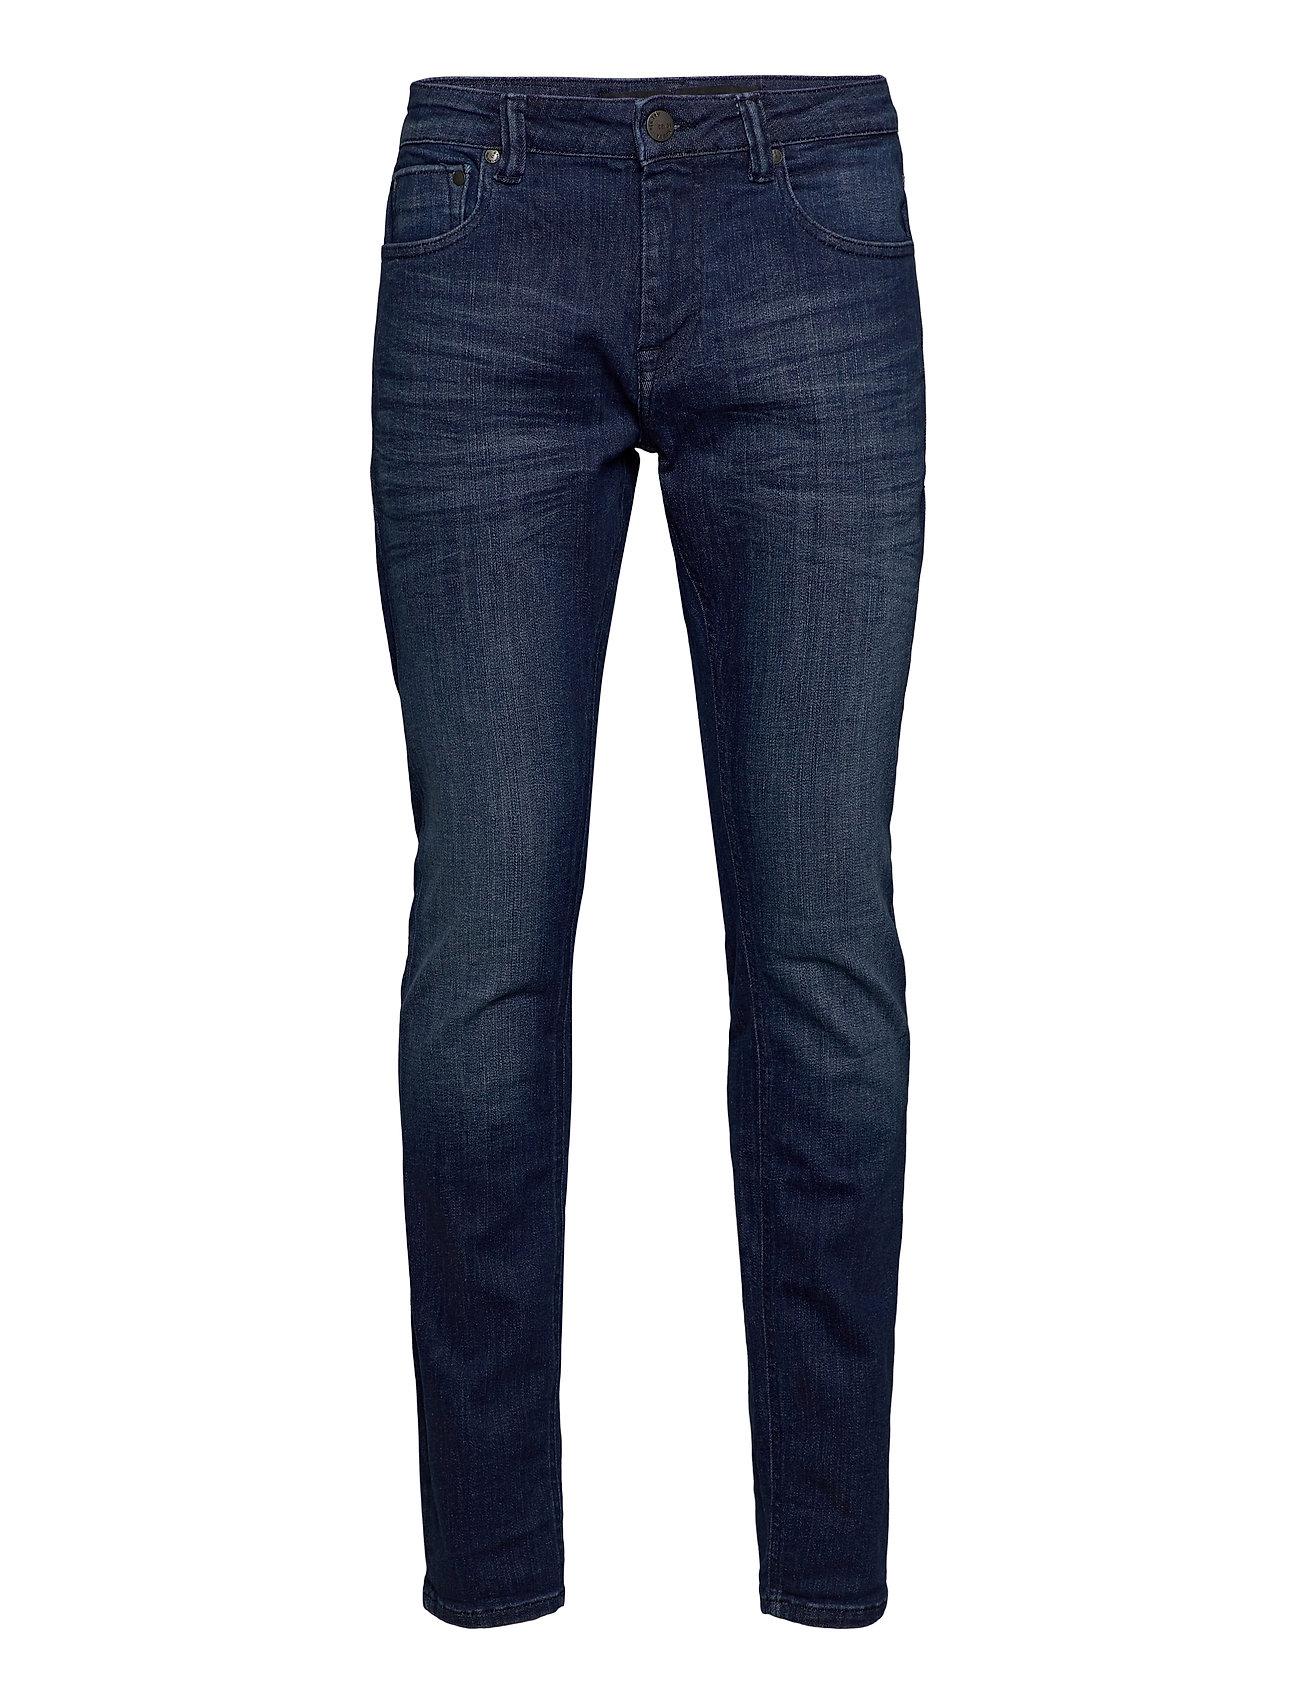 Image of J S K3412 Dk. Jeans Skinny Jeans Blå Gabba (3452761561)